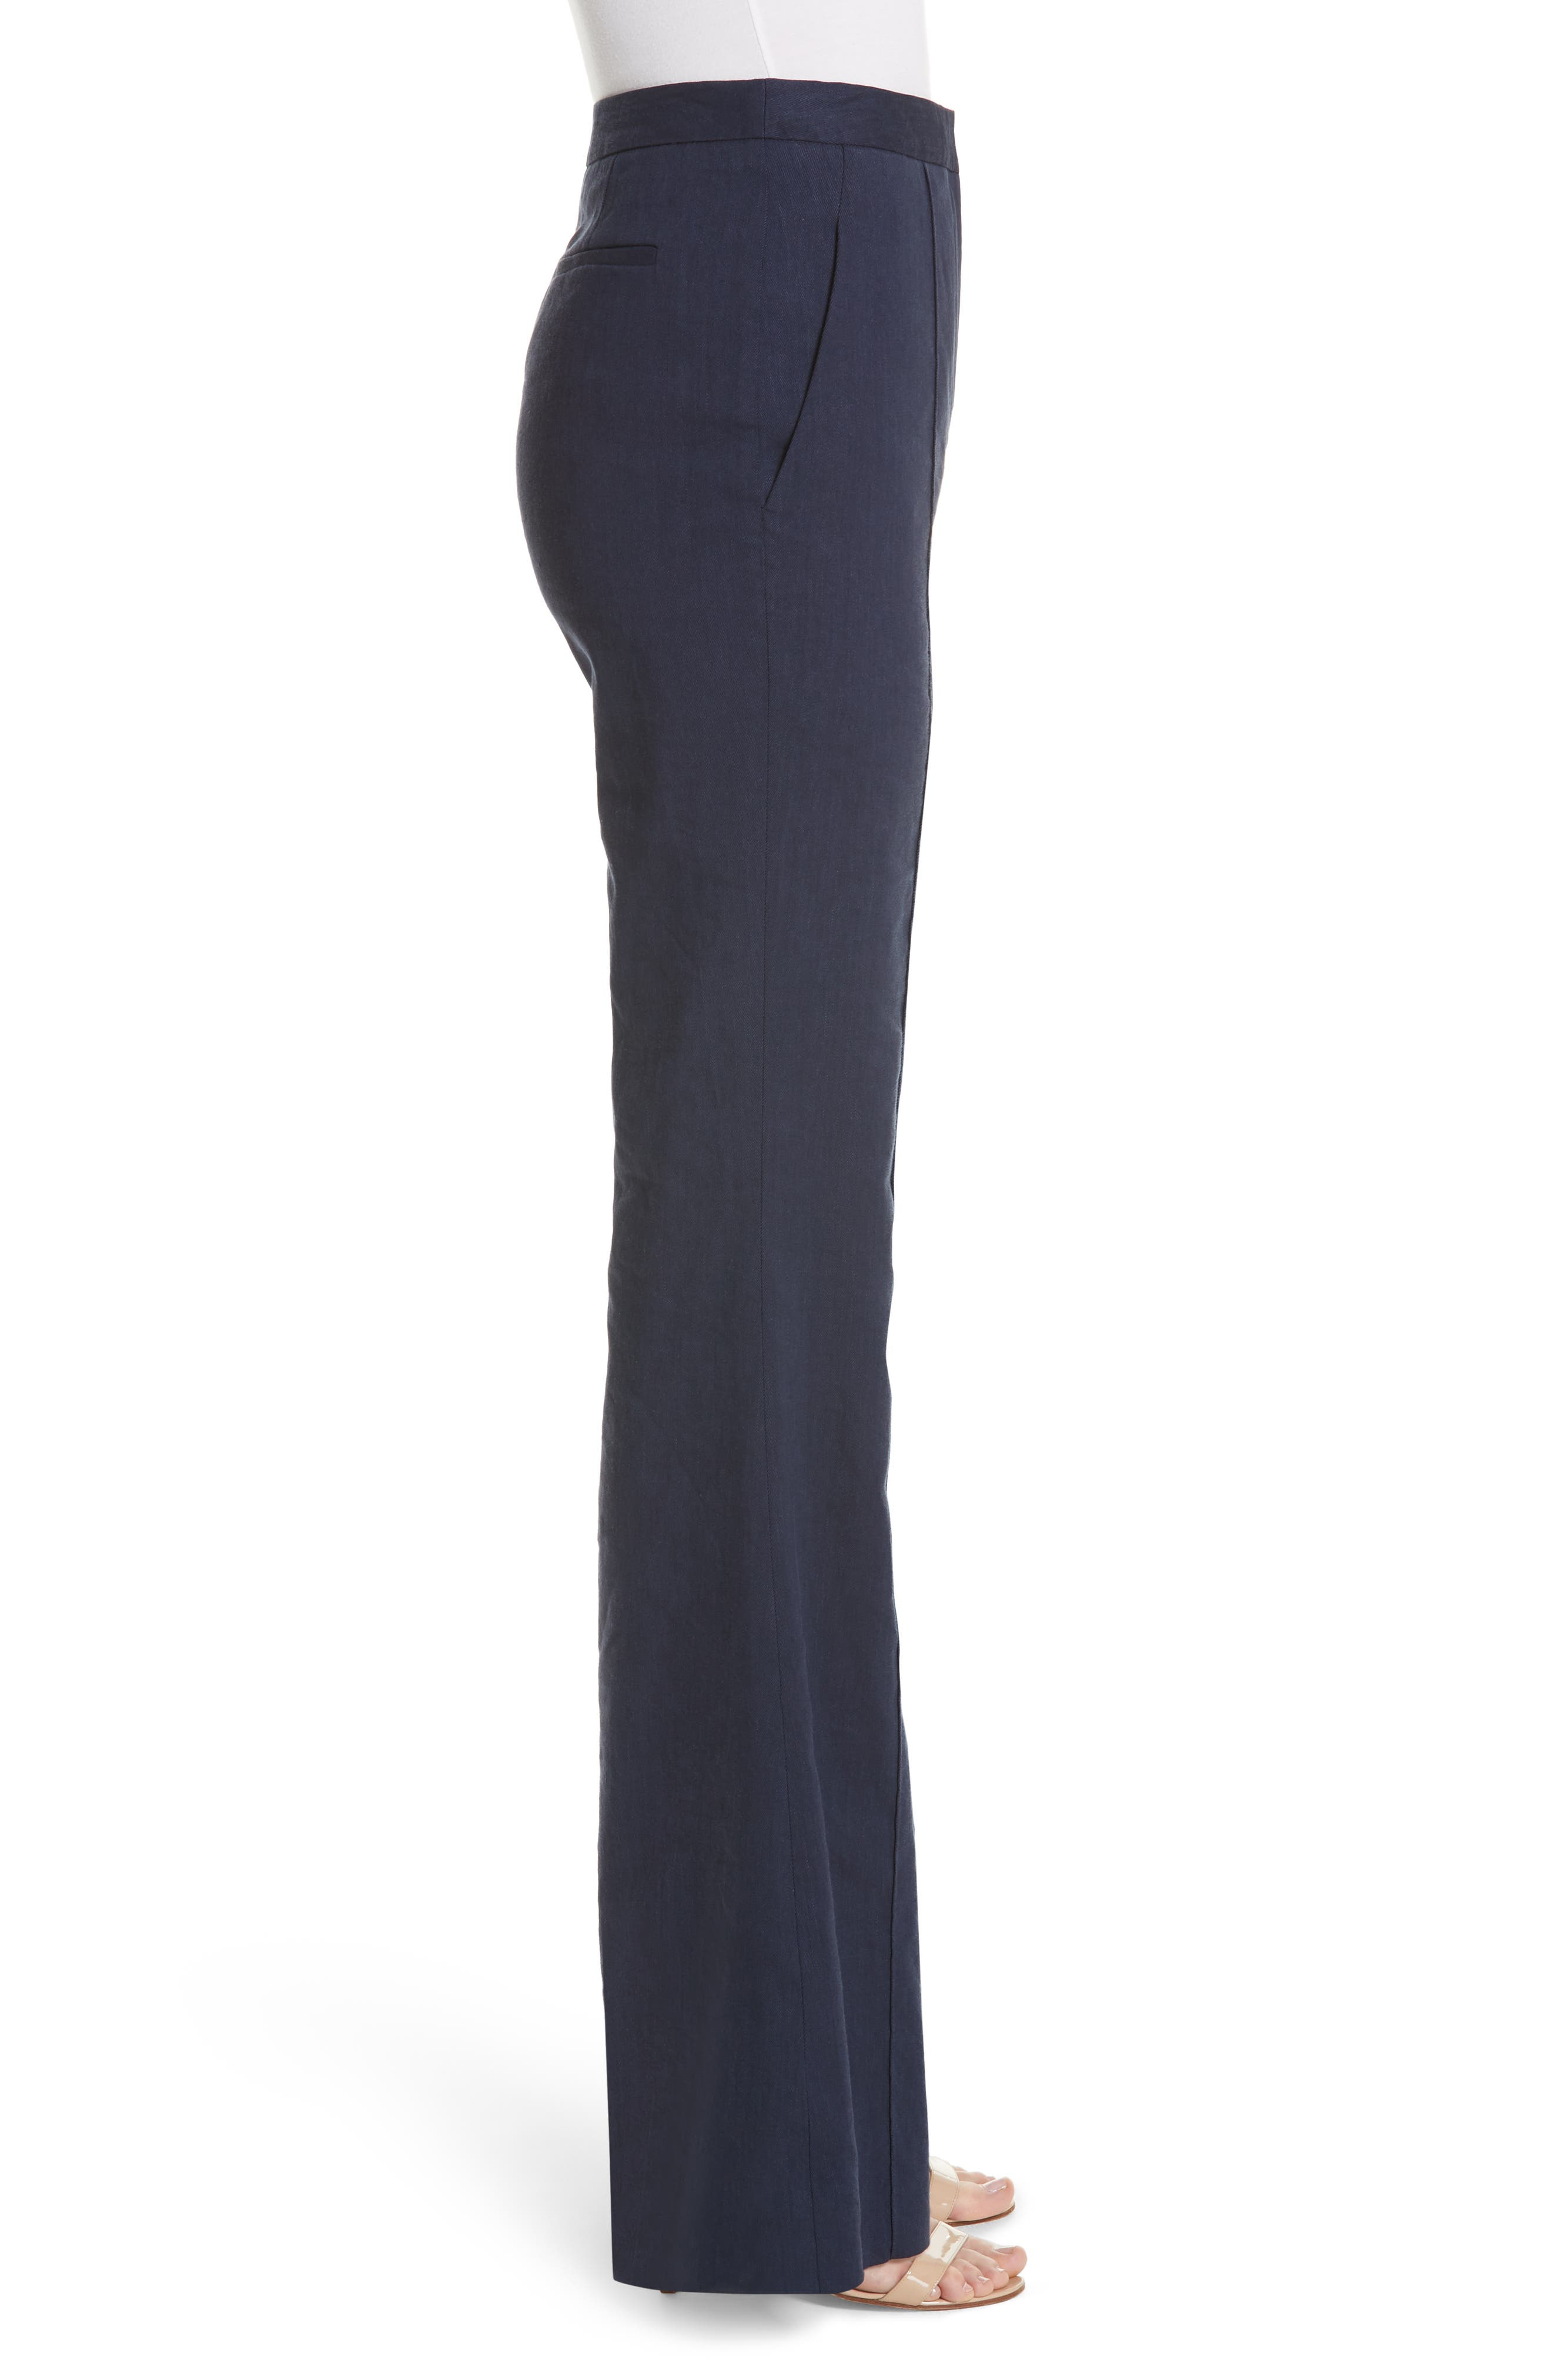 Diane von Furstenberg Pleat Front Flare Stretch Linen Blend Pants,                             Alternate thumbnail 3, color,                             New Navy